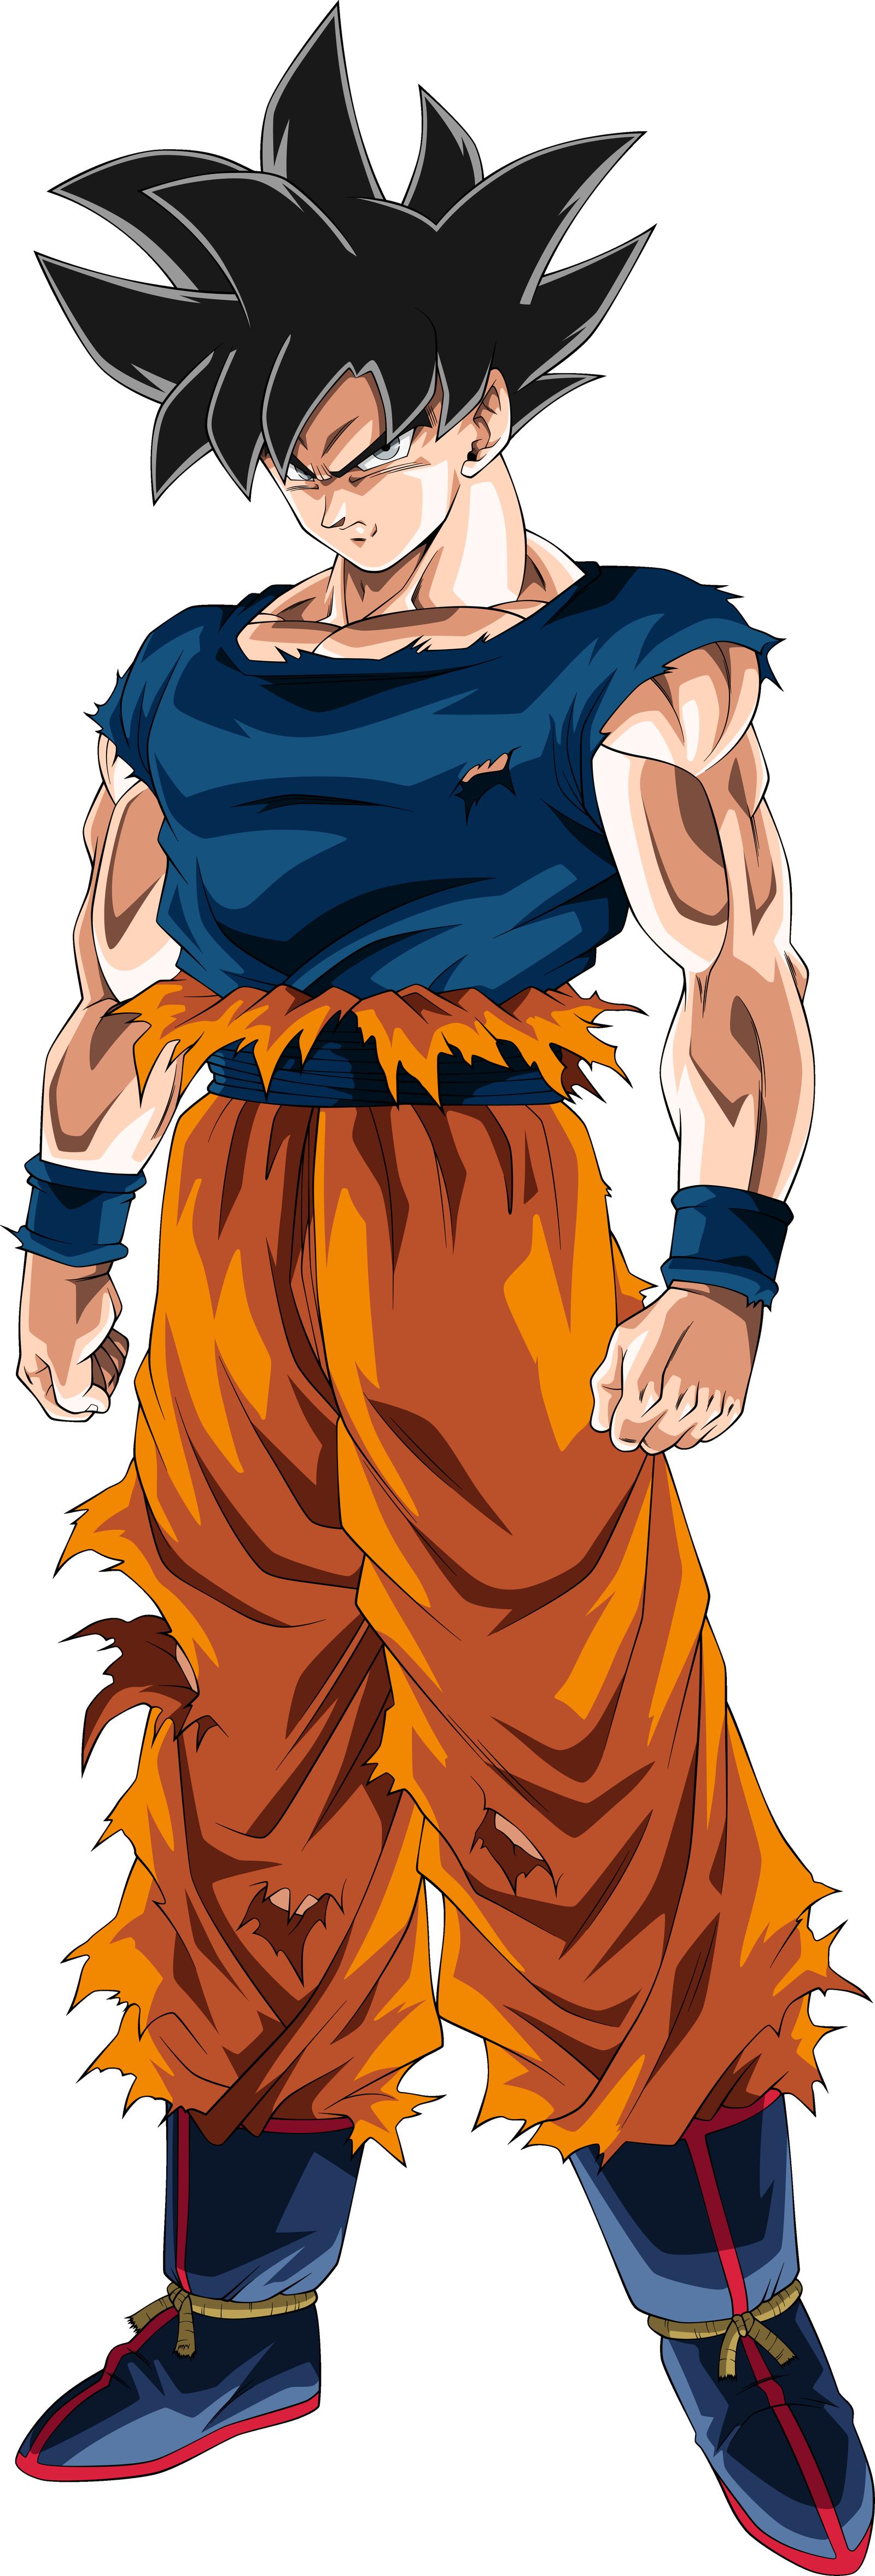 Goku Ultra Instinct Sign Shintani Palette By Thetabbyneko On Deviantart Dragon Ball Super Manga Dragon Ball Super Artwork Anime Dragon Ball Super